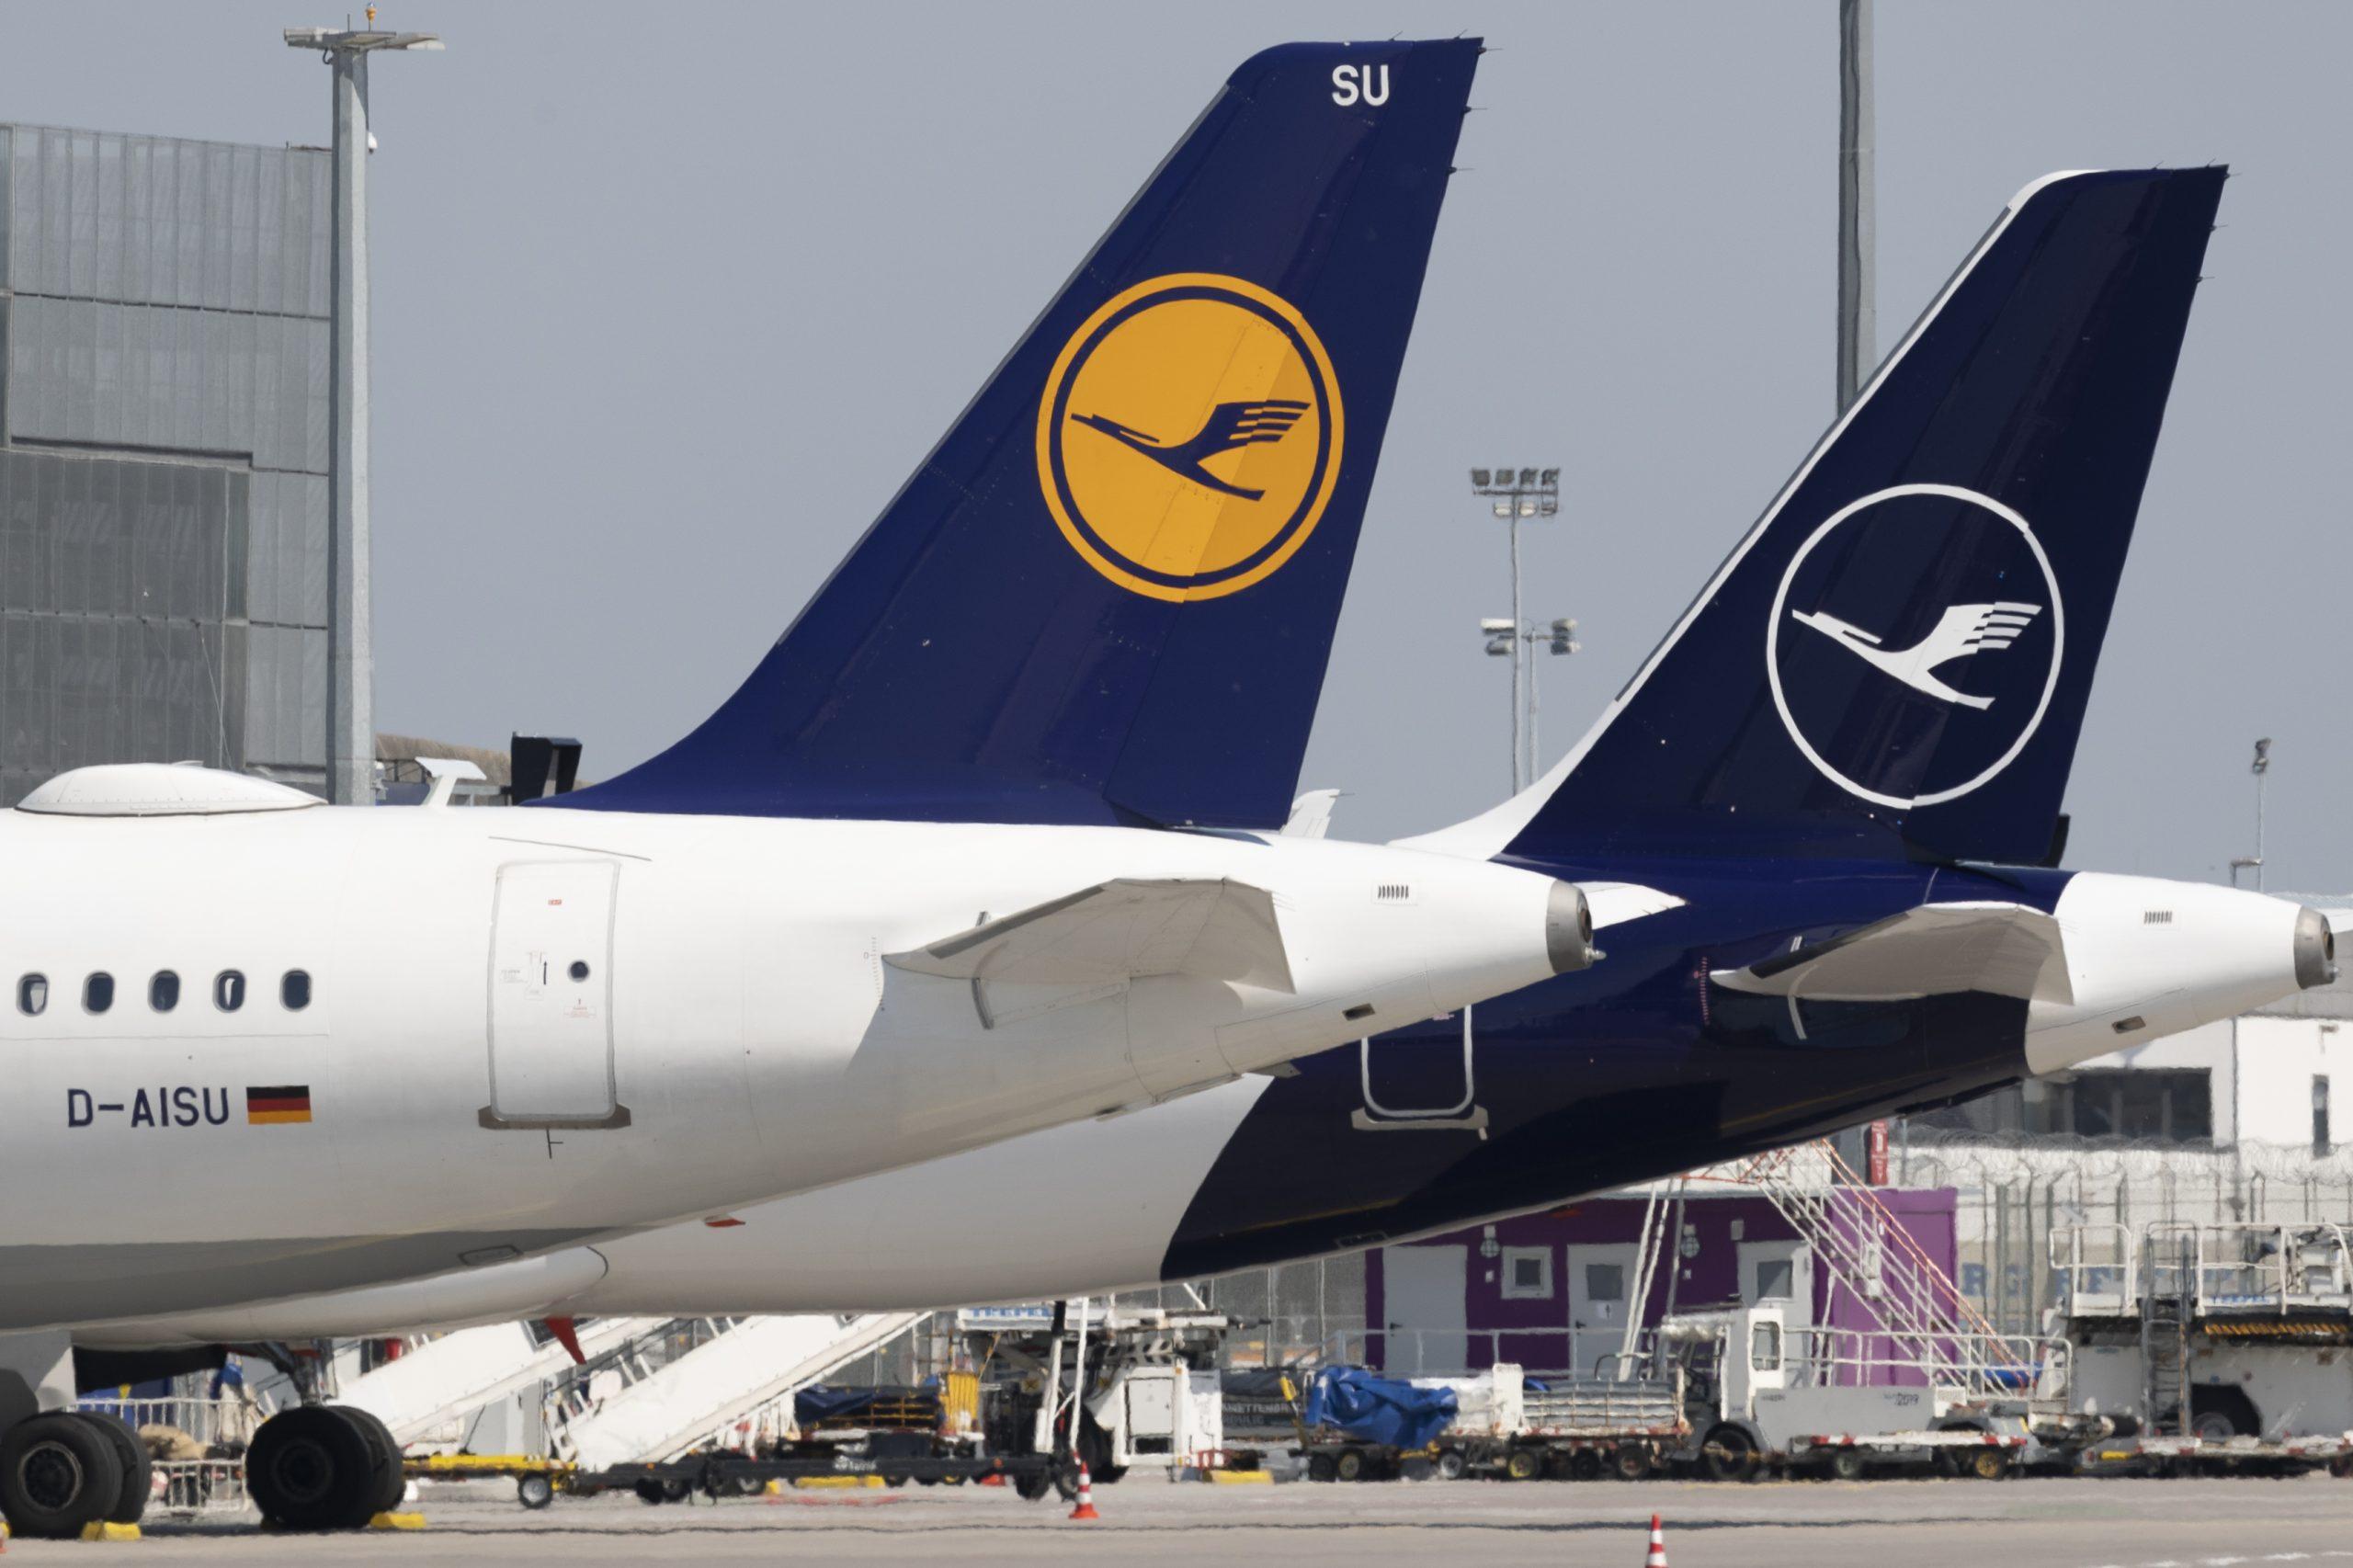 Airbus A321-200 fra Lufthansa i Frankfurt Airport.  (Foto: © Thorbjørn Brunander Sund | Danish Aviation Photo)